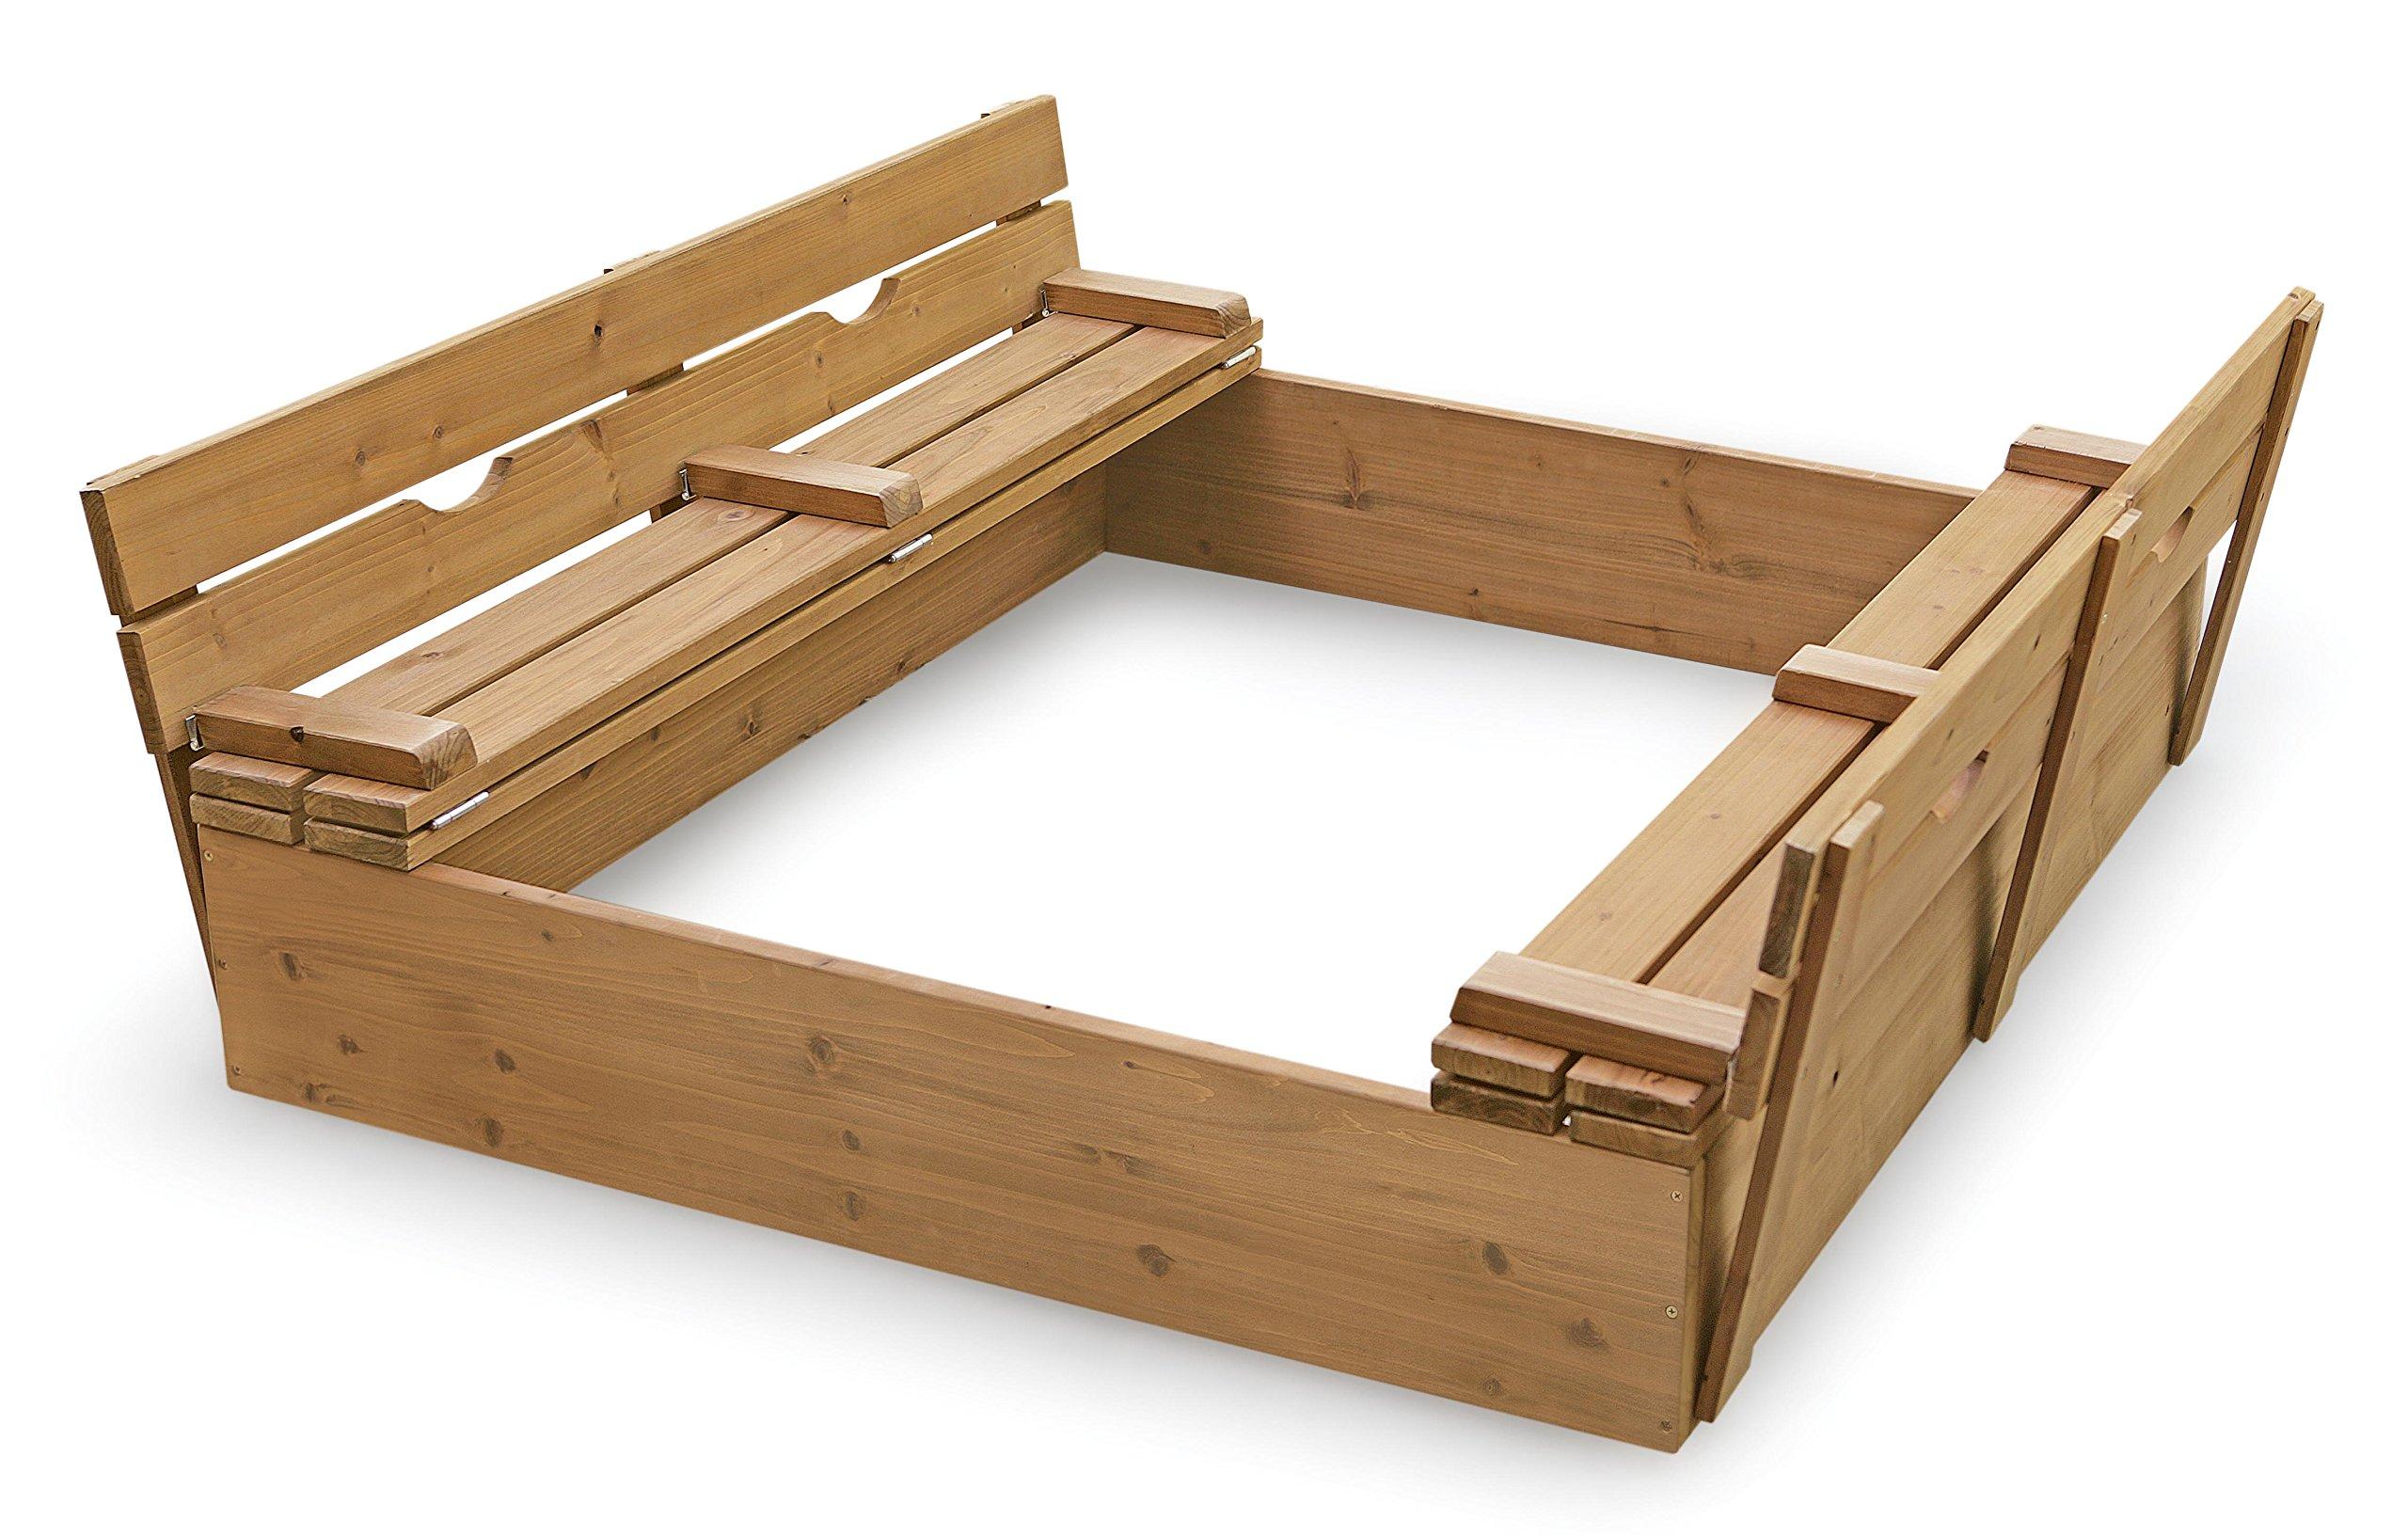 Badger Basket Covered Convertible Cedar Sandbox with Bench Seats, Natural by Badger Basket